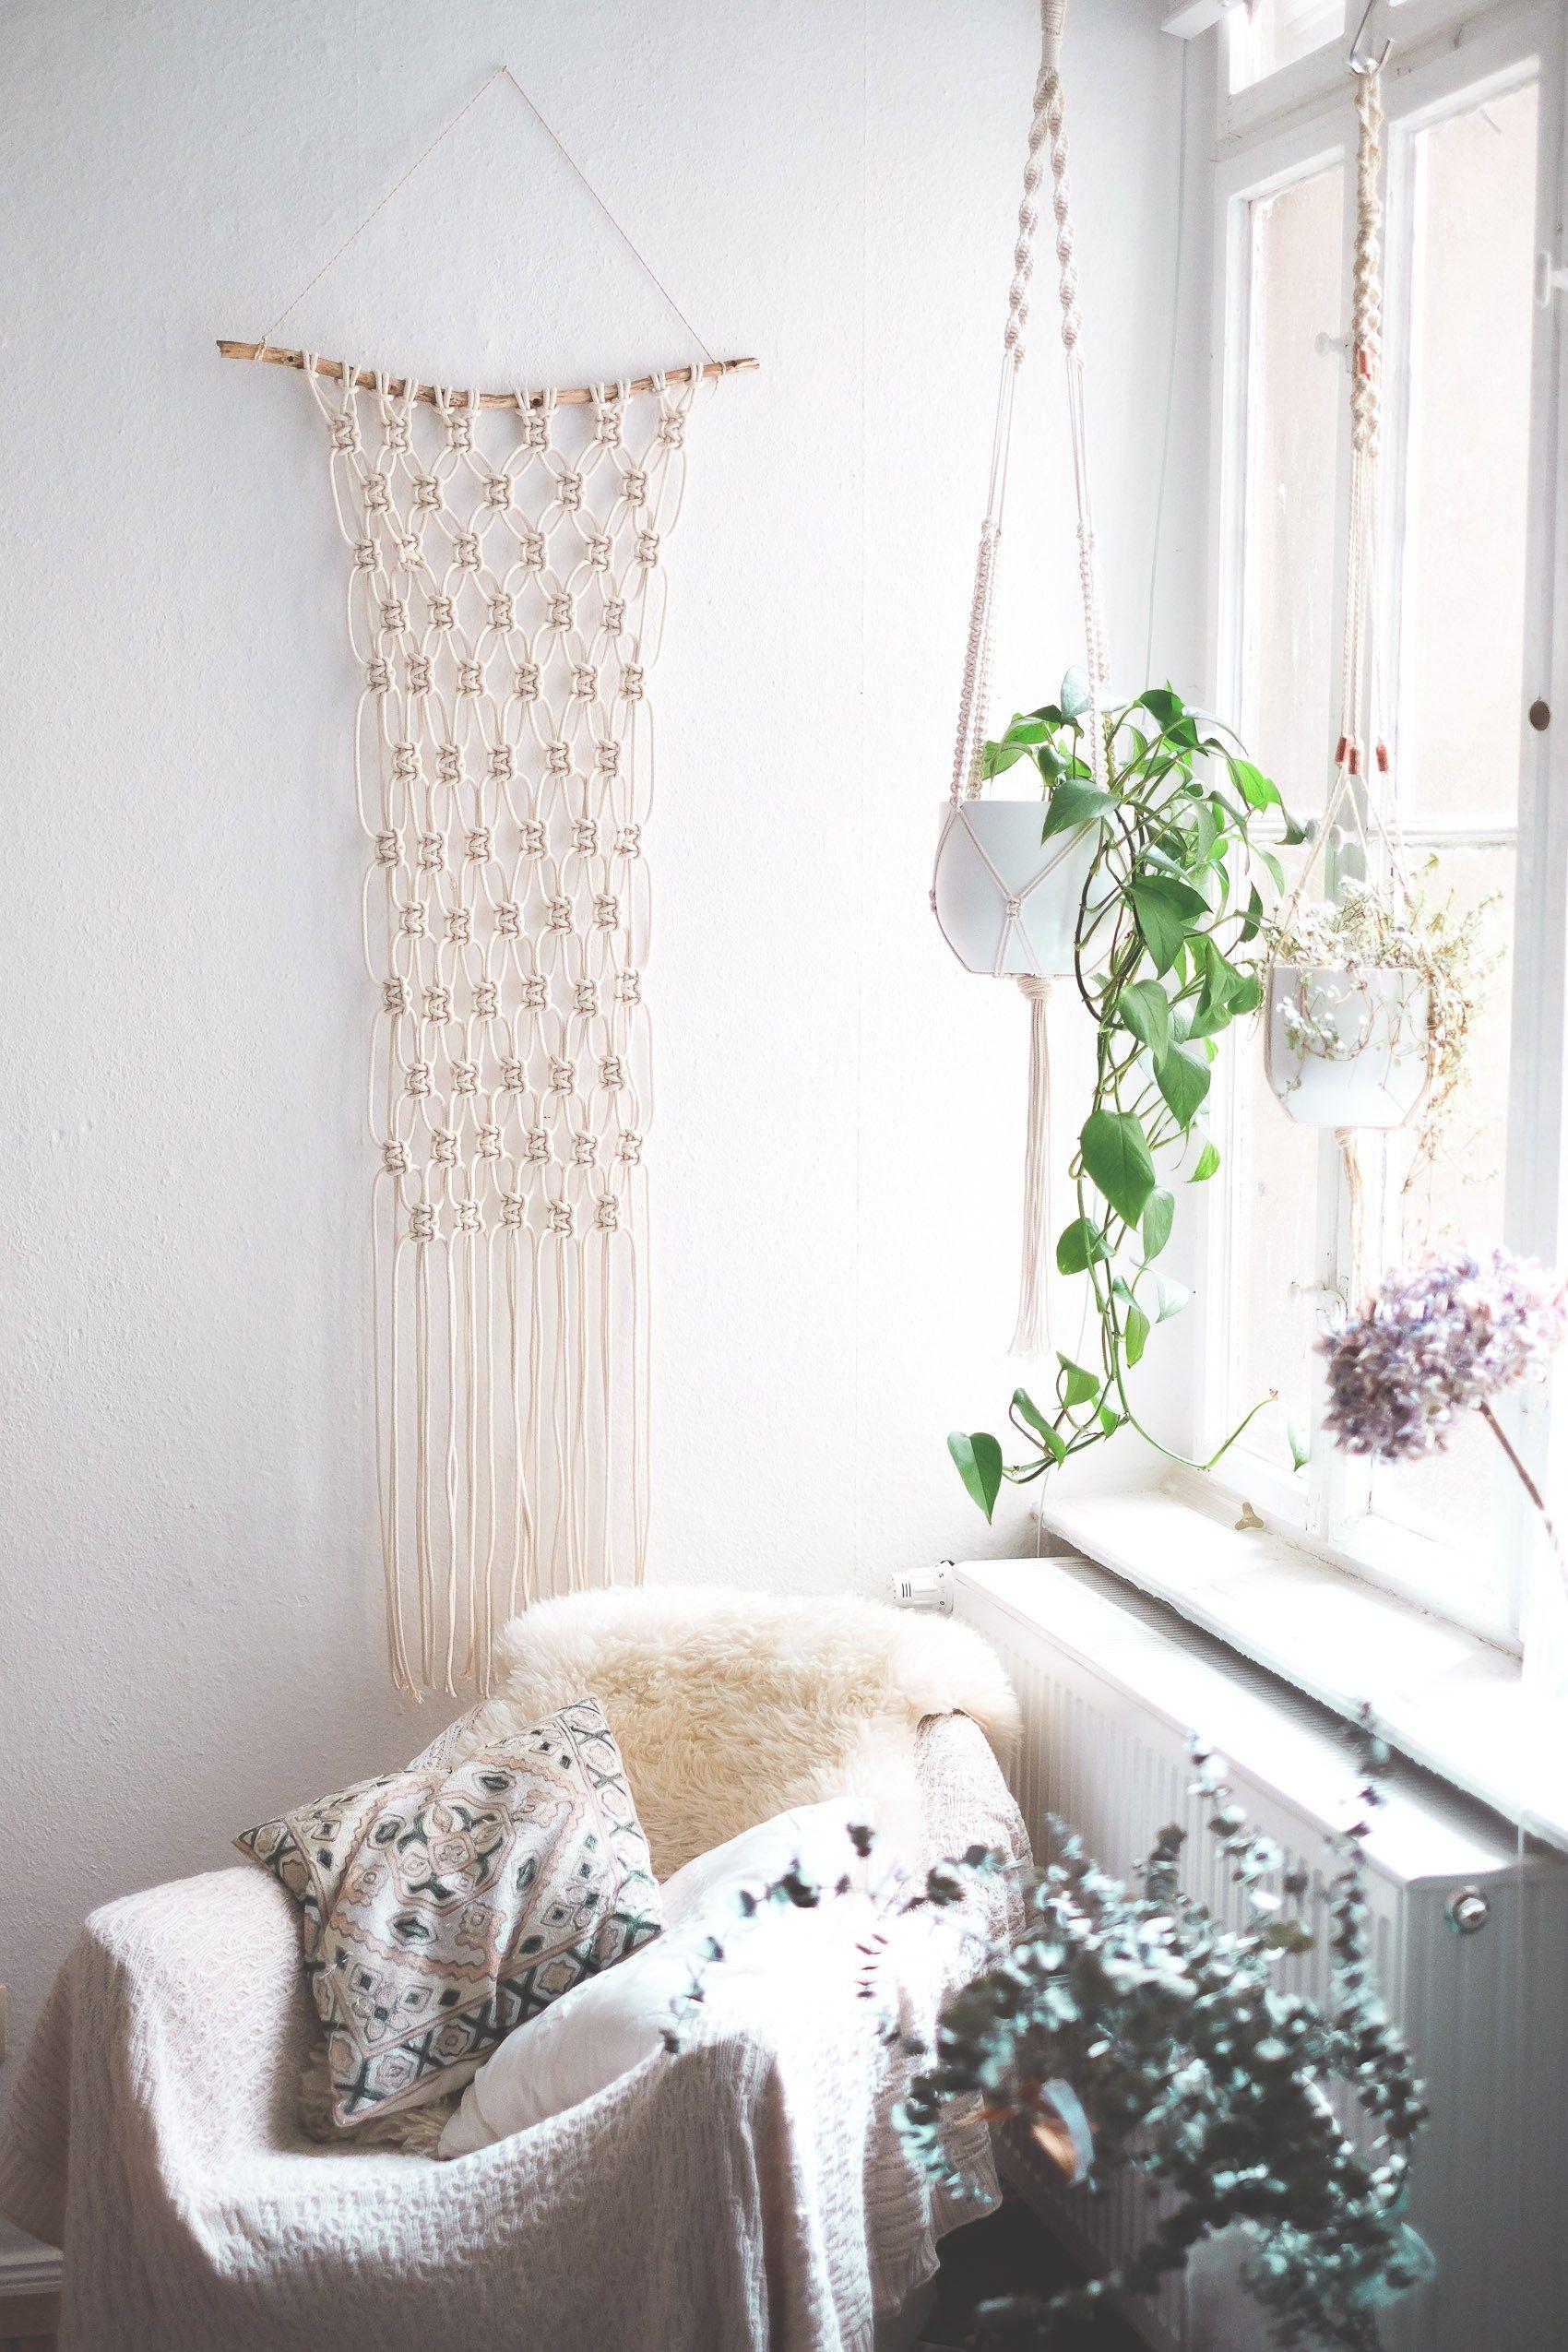 Super Easy Step By DIY Macrame Wall Hanging Tutorial